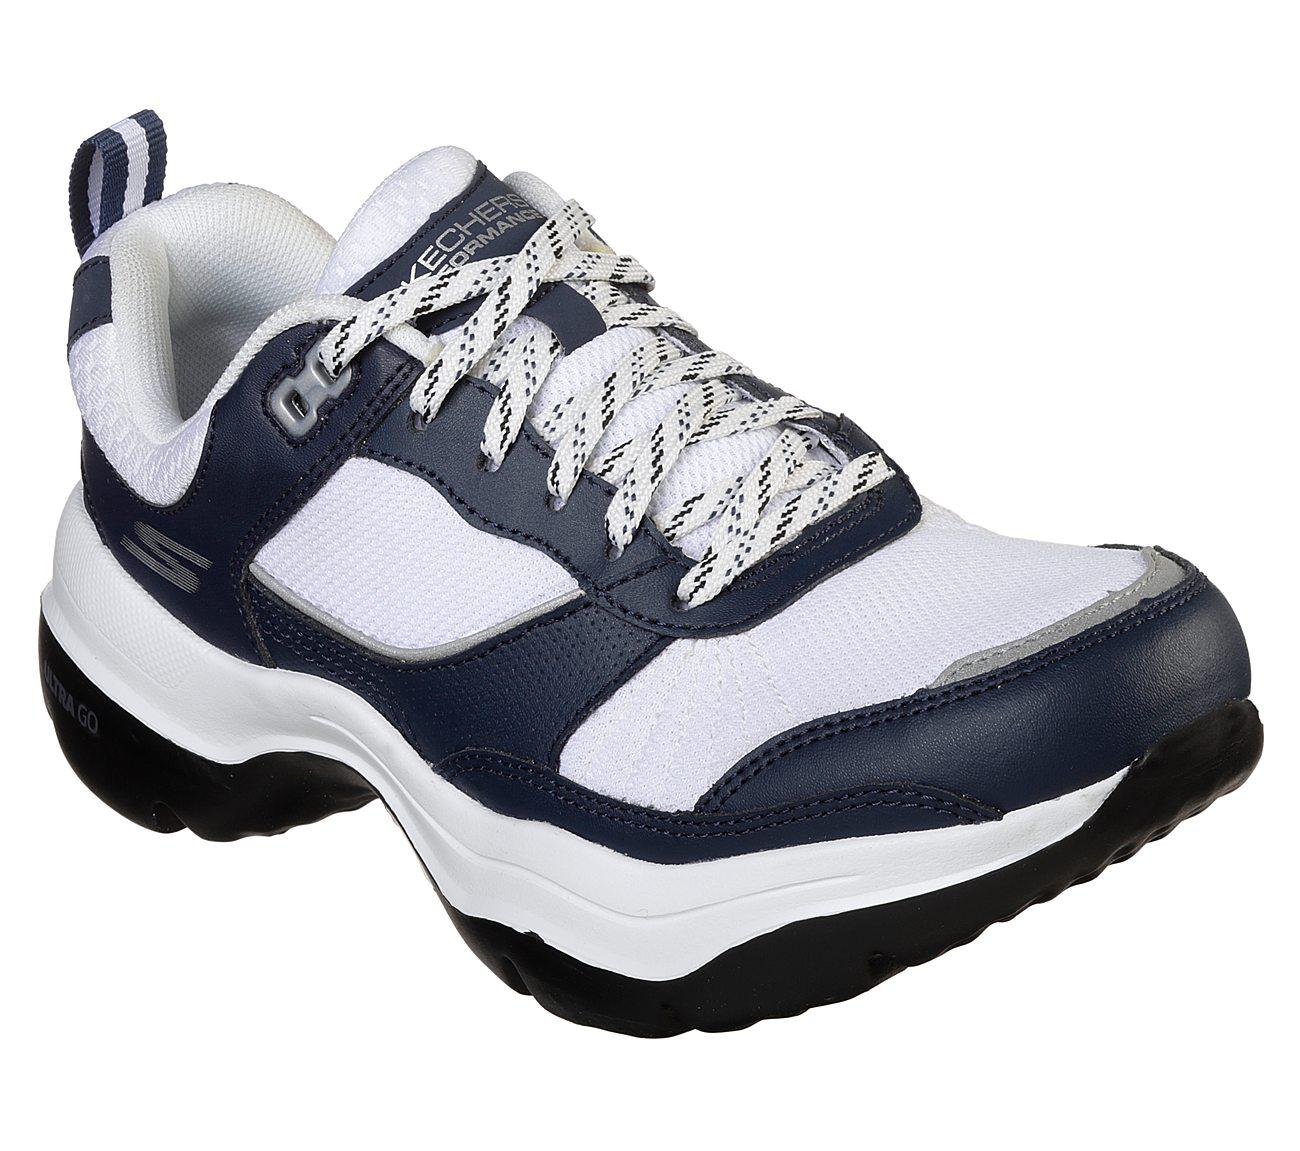 8c2cfd273d6b Buy SKECHERS Skechers GOwalk Mantra Ultra Skechers Performance Shoes ...